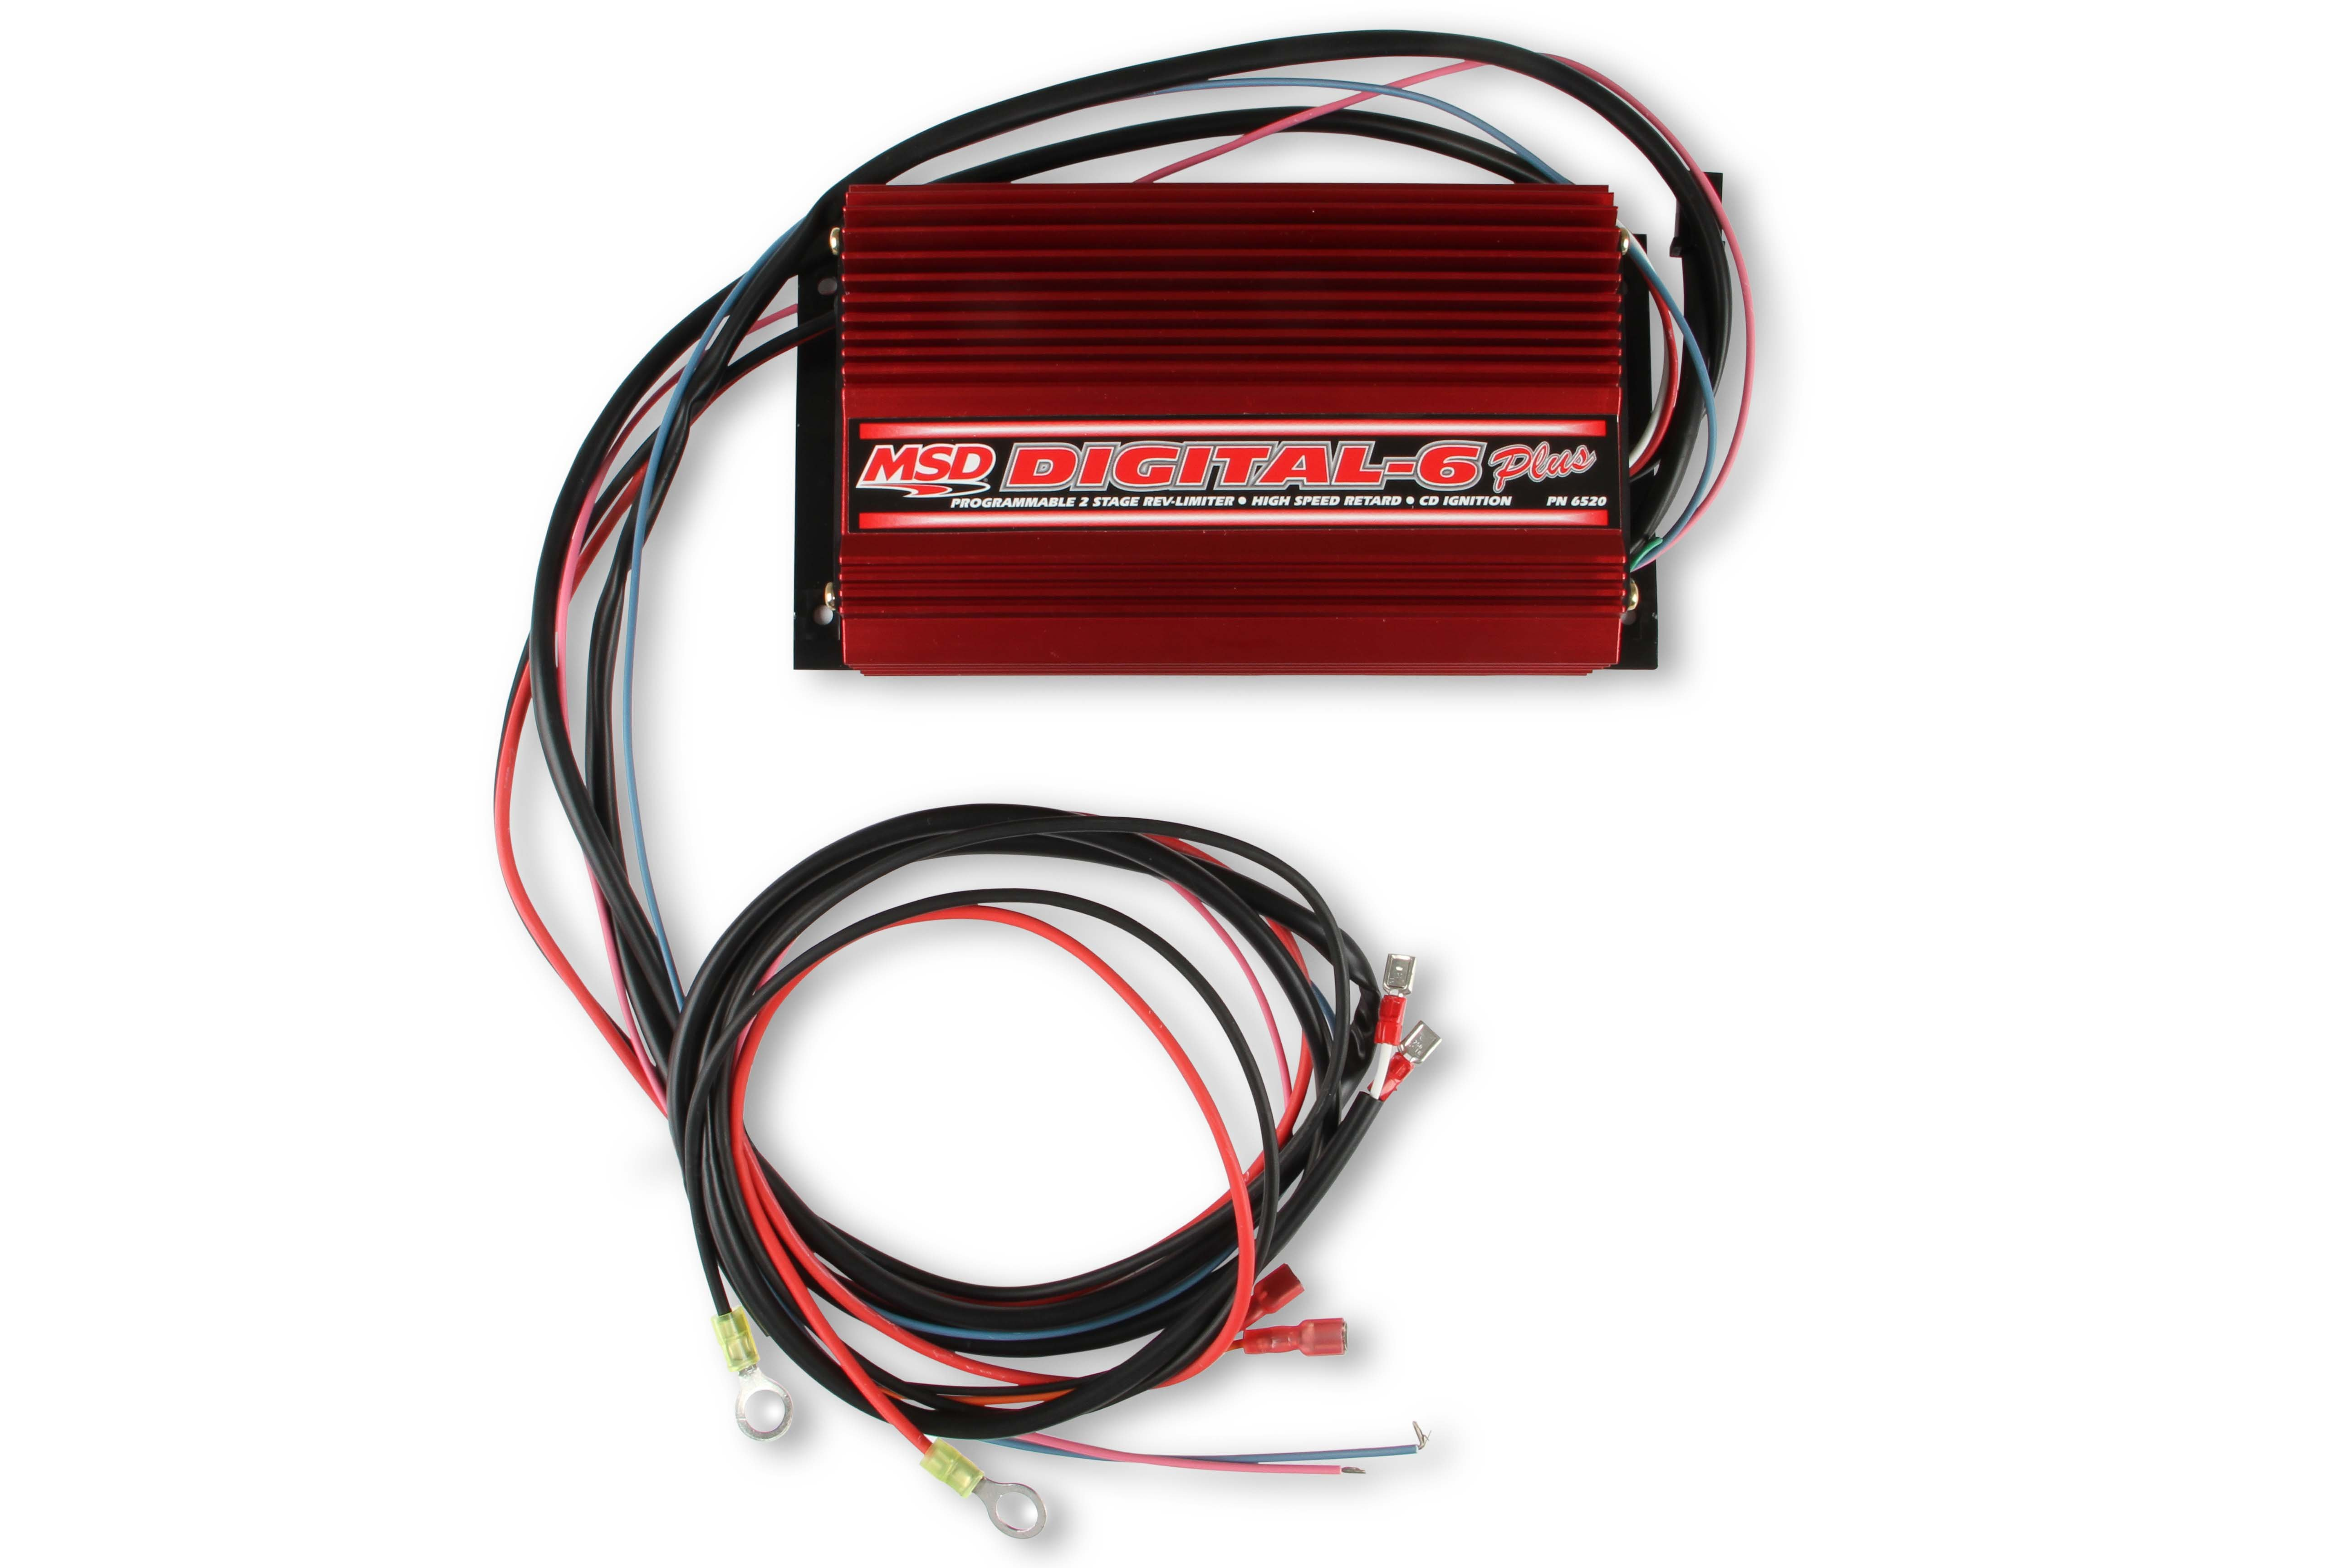 MSD Digital 6-Plus Ignition Control